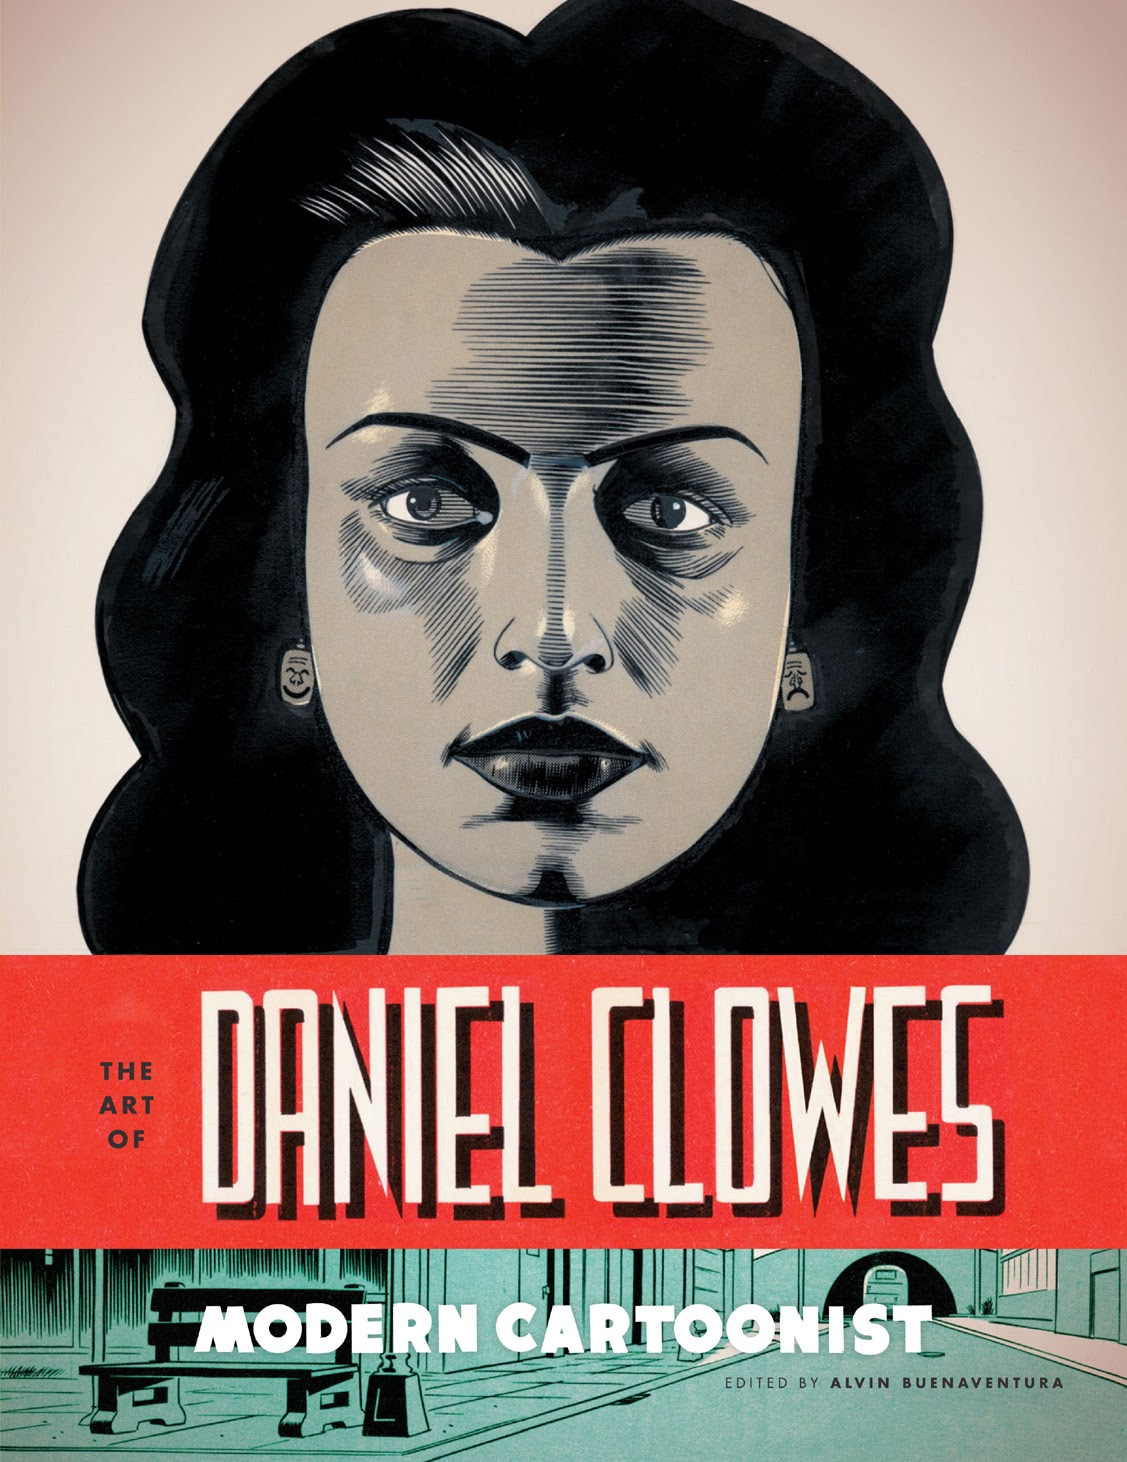 The Art of Daniel Clowes: Modern Cartoonist TPB Page 1